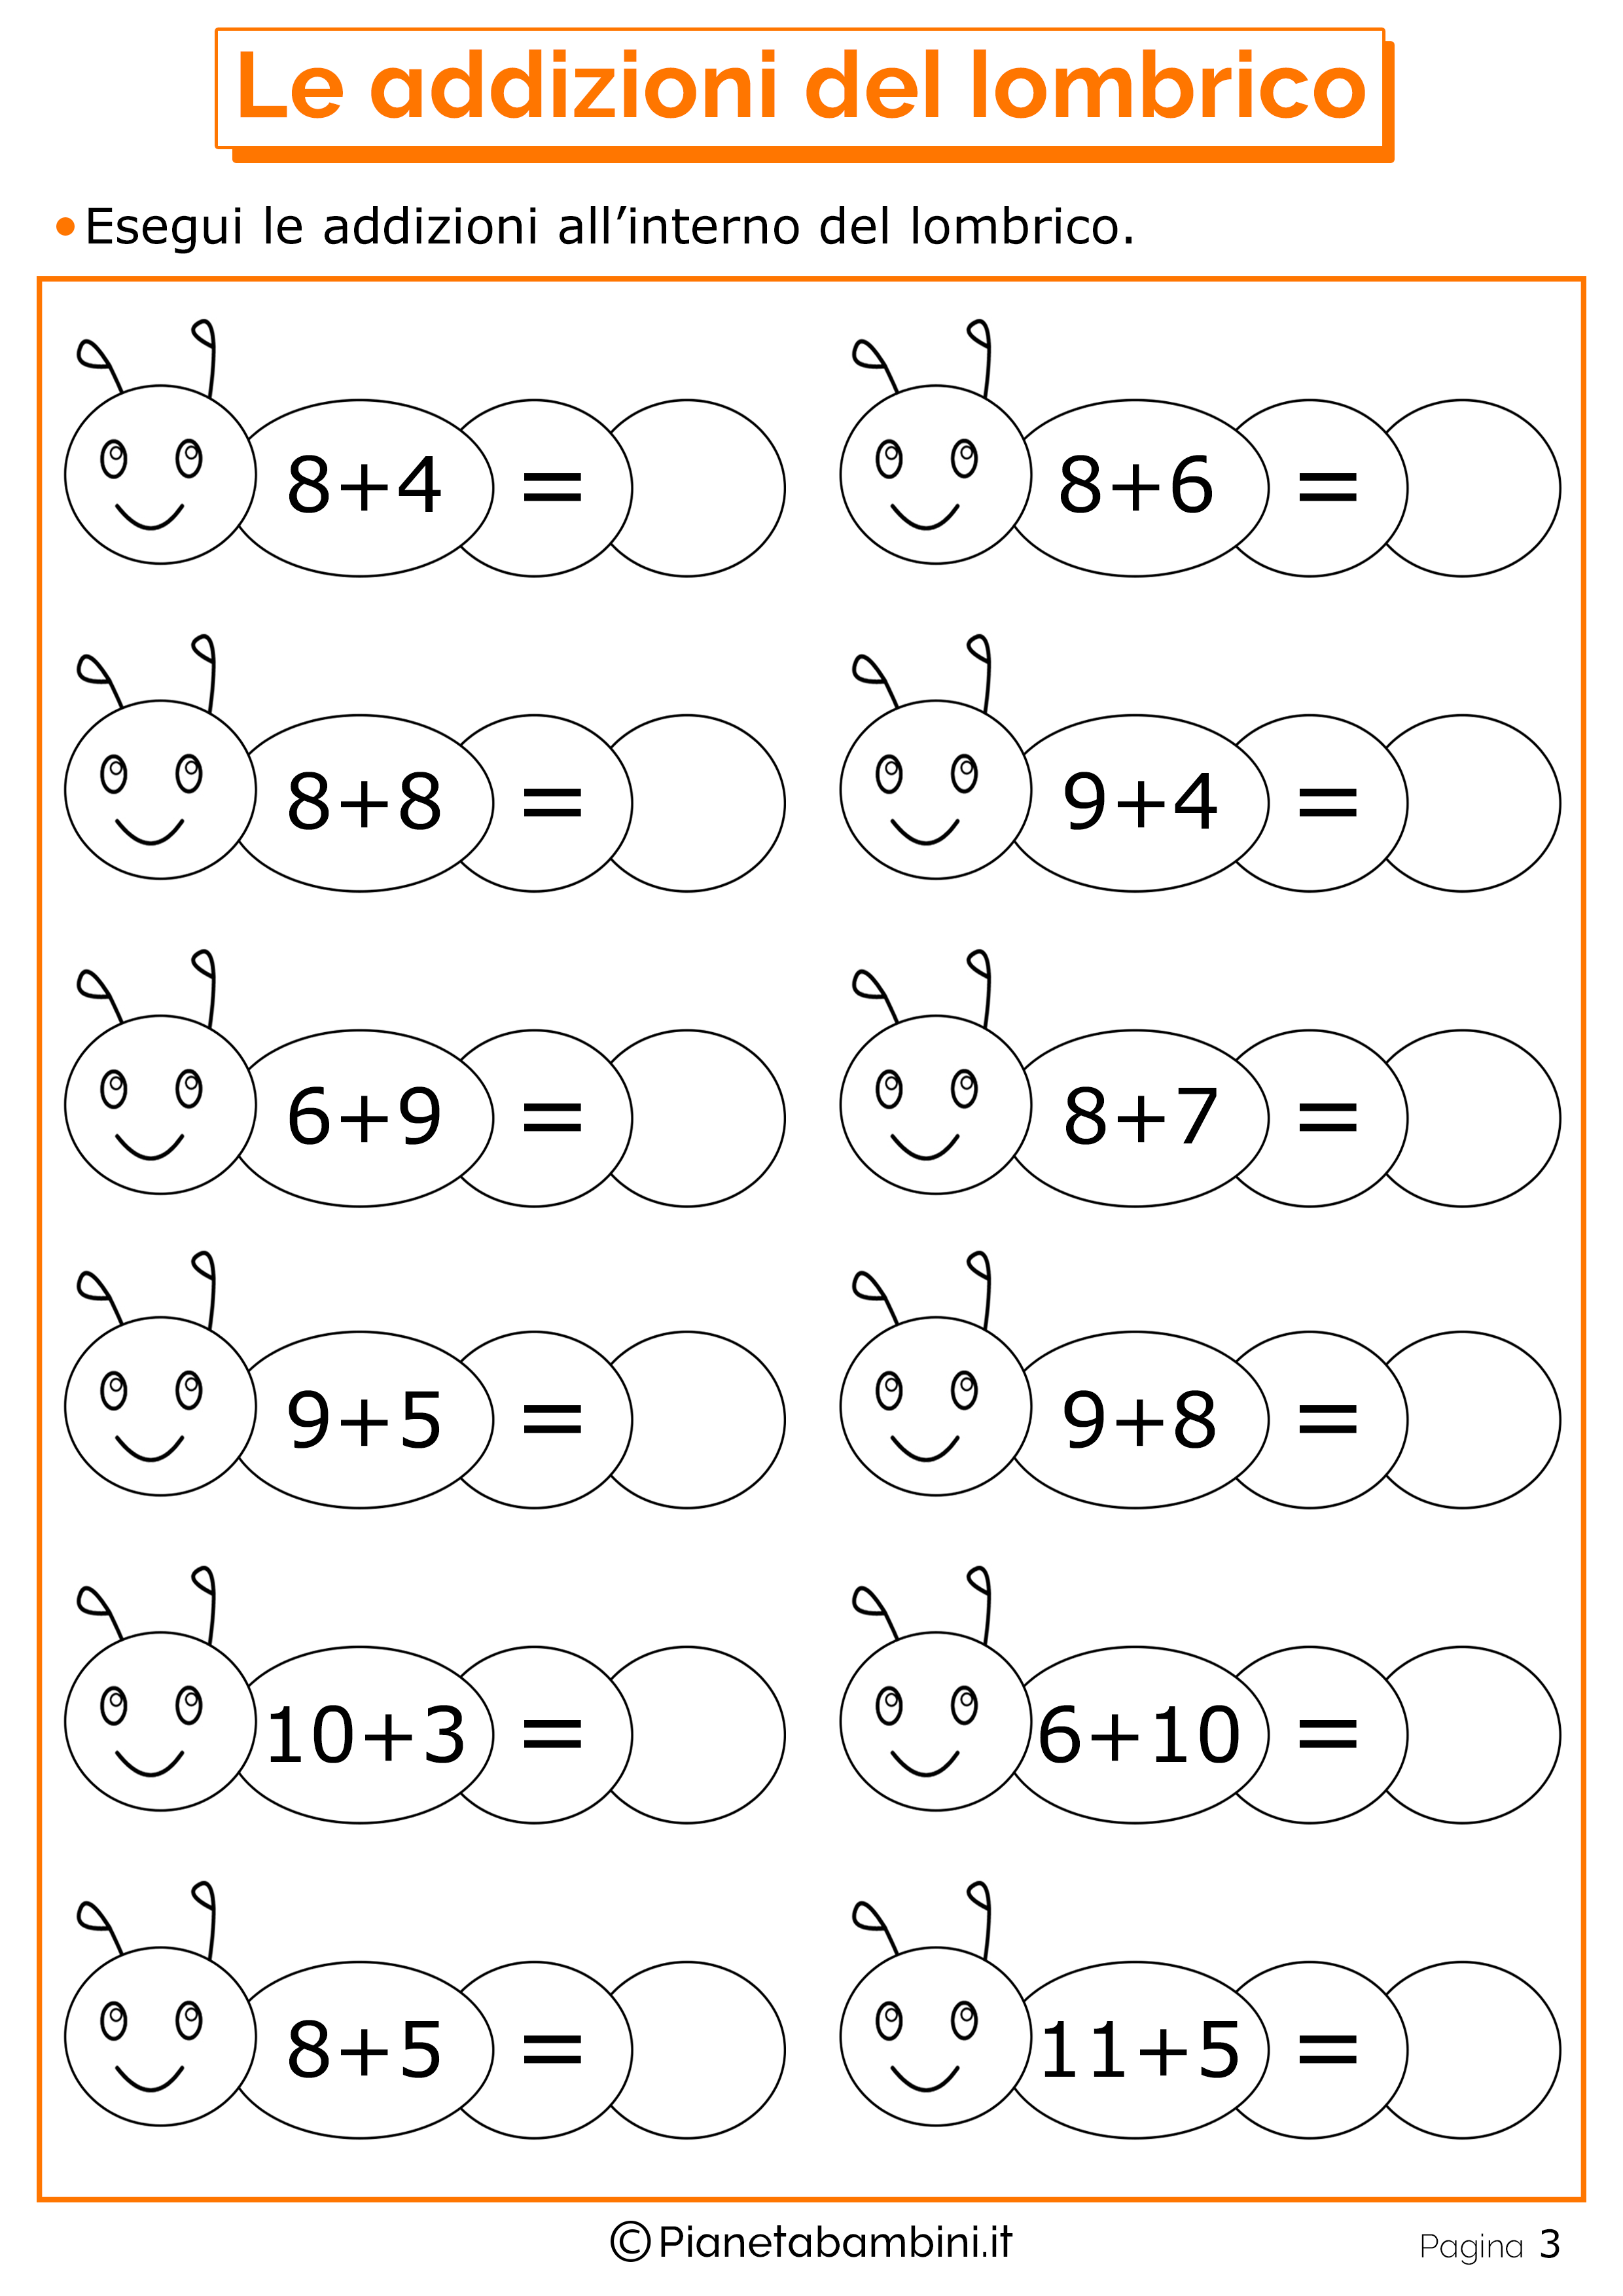 Disegni Da Colorare Di Matematica Bimbi 5 Anni Migliori Pagine Da